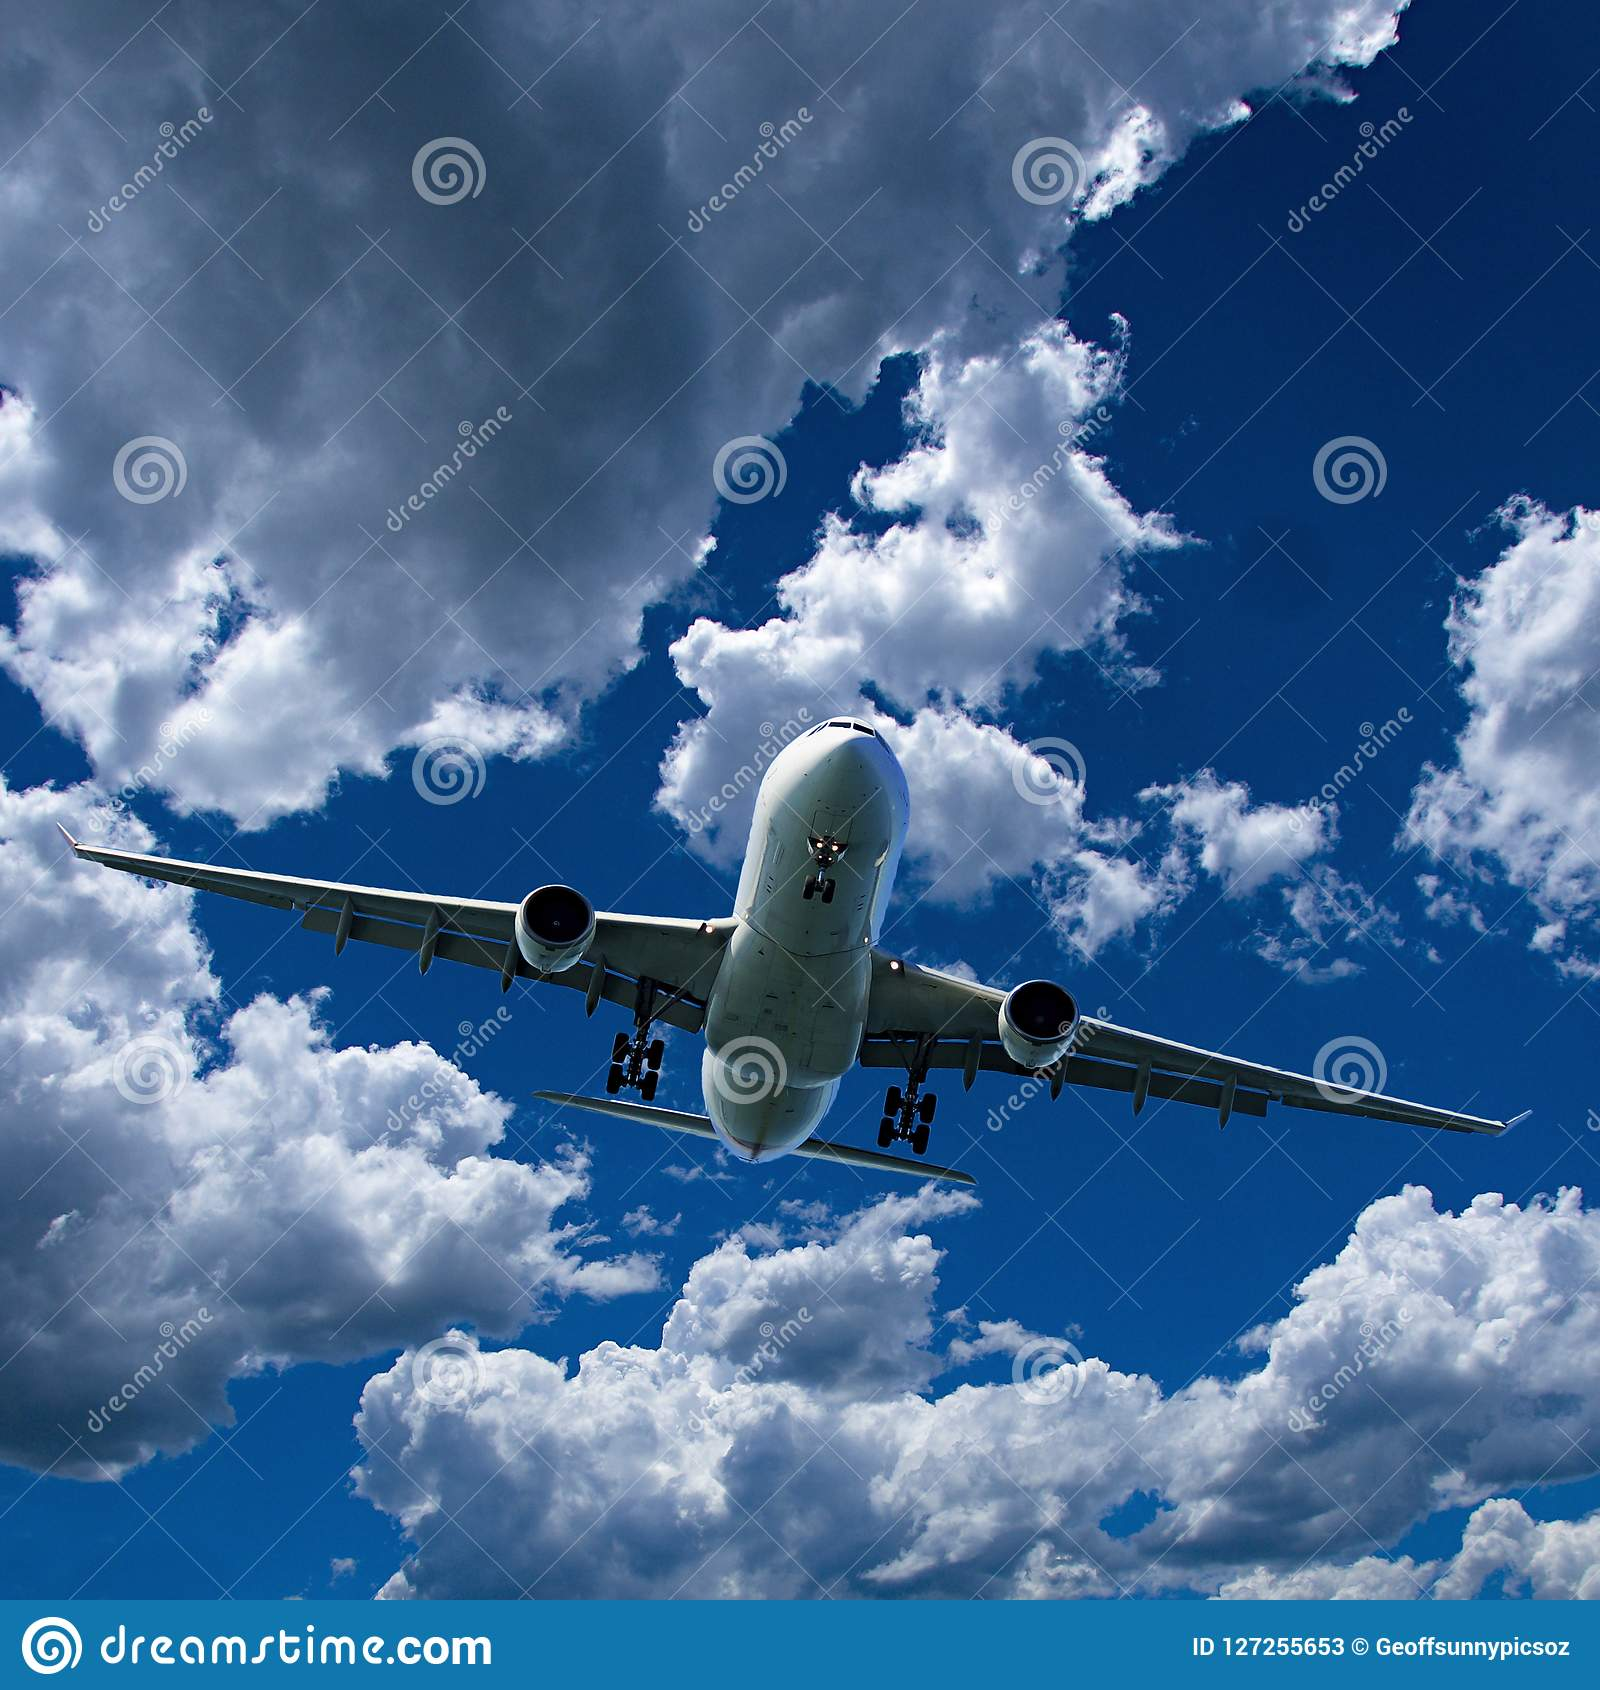 Airliner in flight with Cumulus cloud in blue sky. Australia.